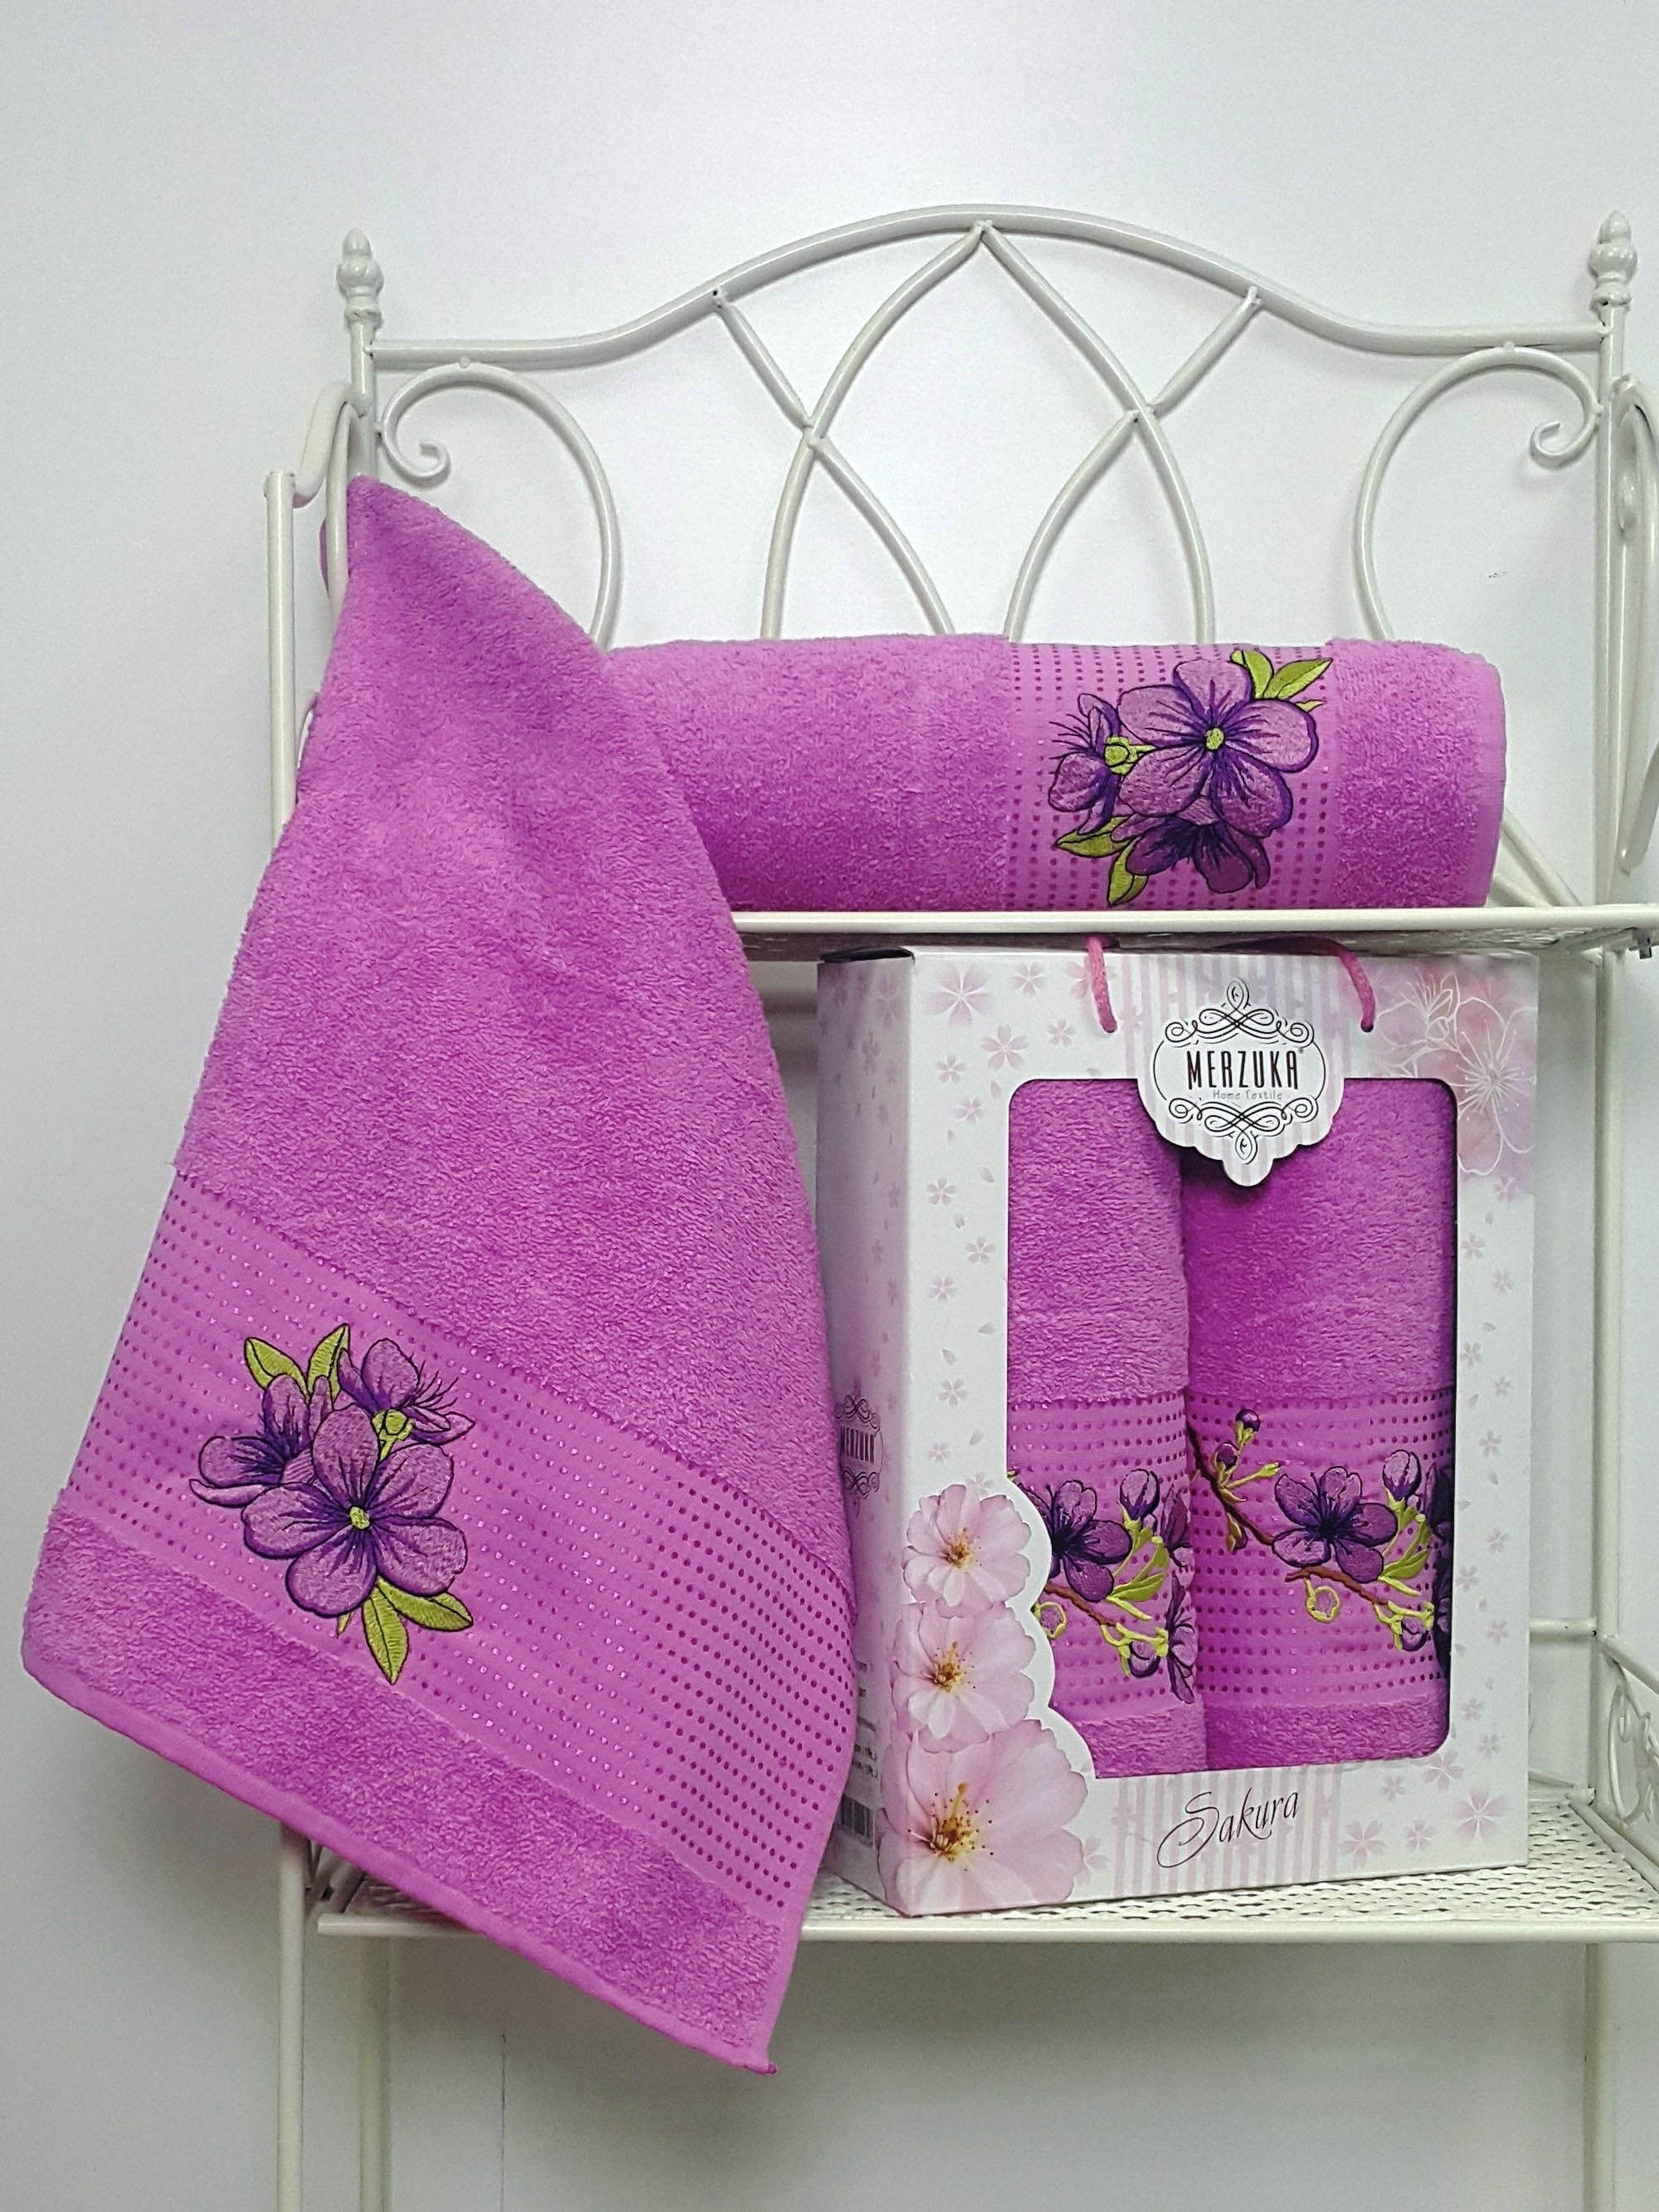 Полотенца Oran Merzuka Полотенце Sakura Цвет: Светло-Лиловый (Набор) набор из 3 полотенец merzuka sakura 50х90 2 70х140 8432 розовый